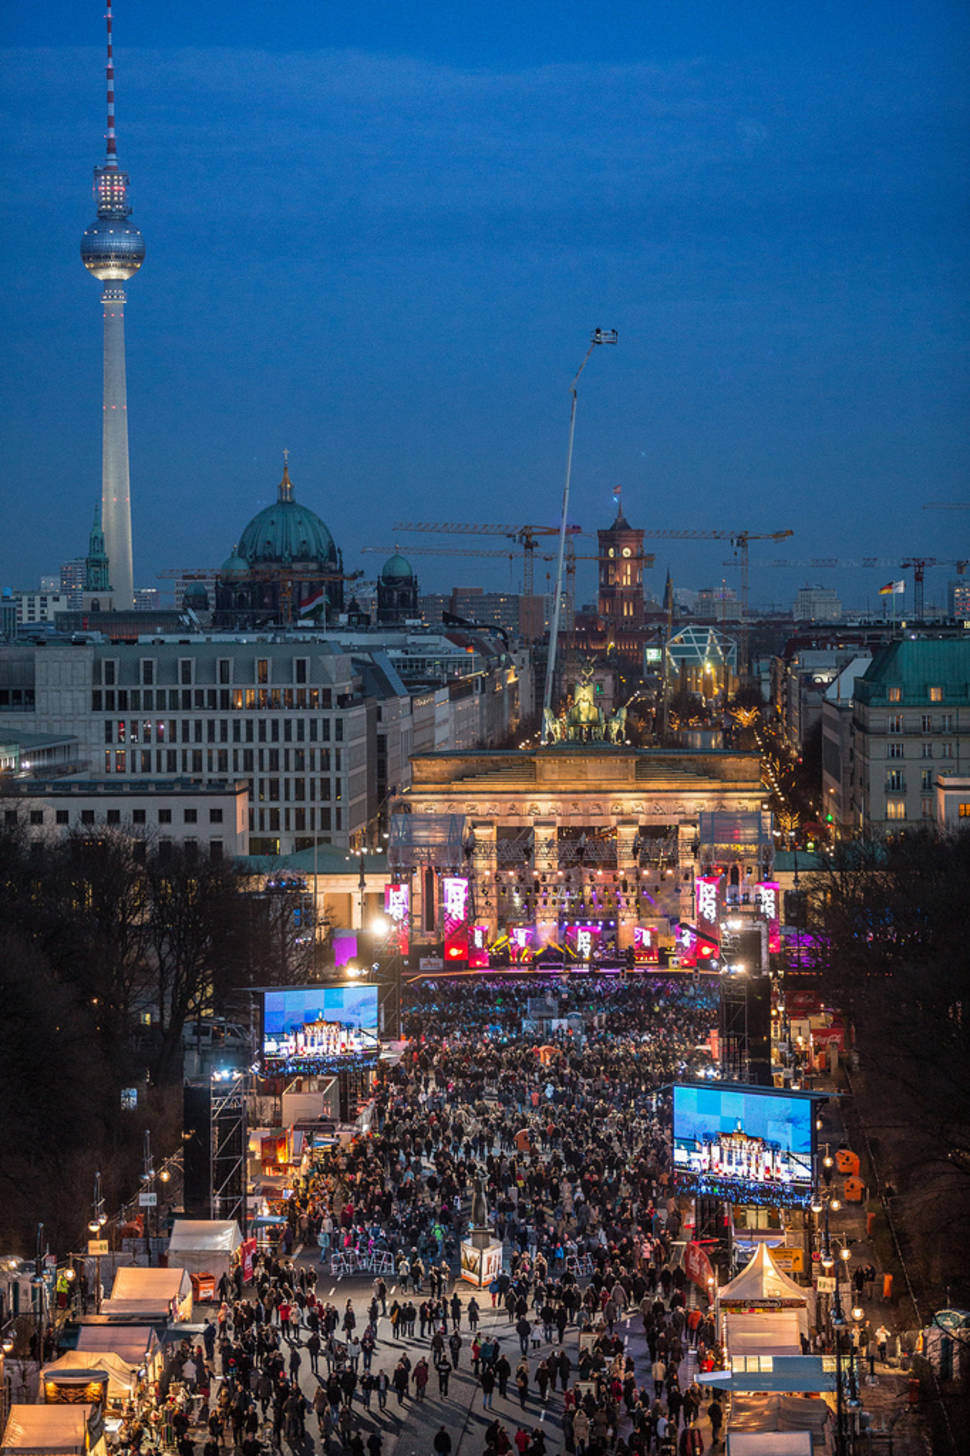 New Year's Eve at Brandenburg Gate